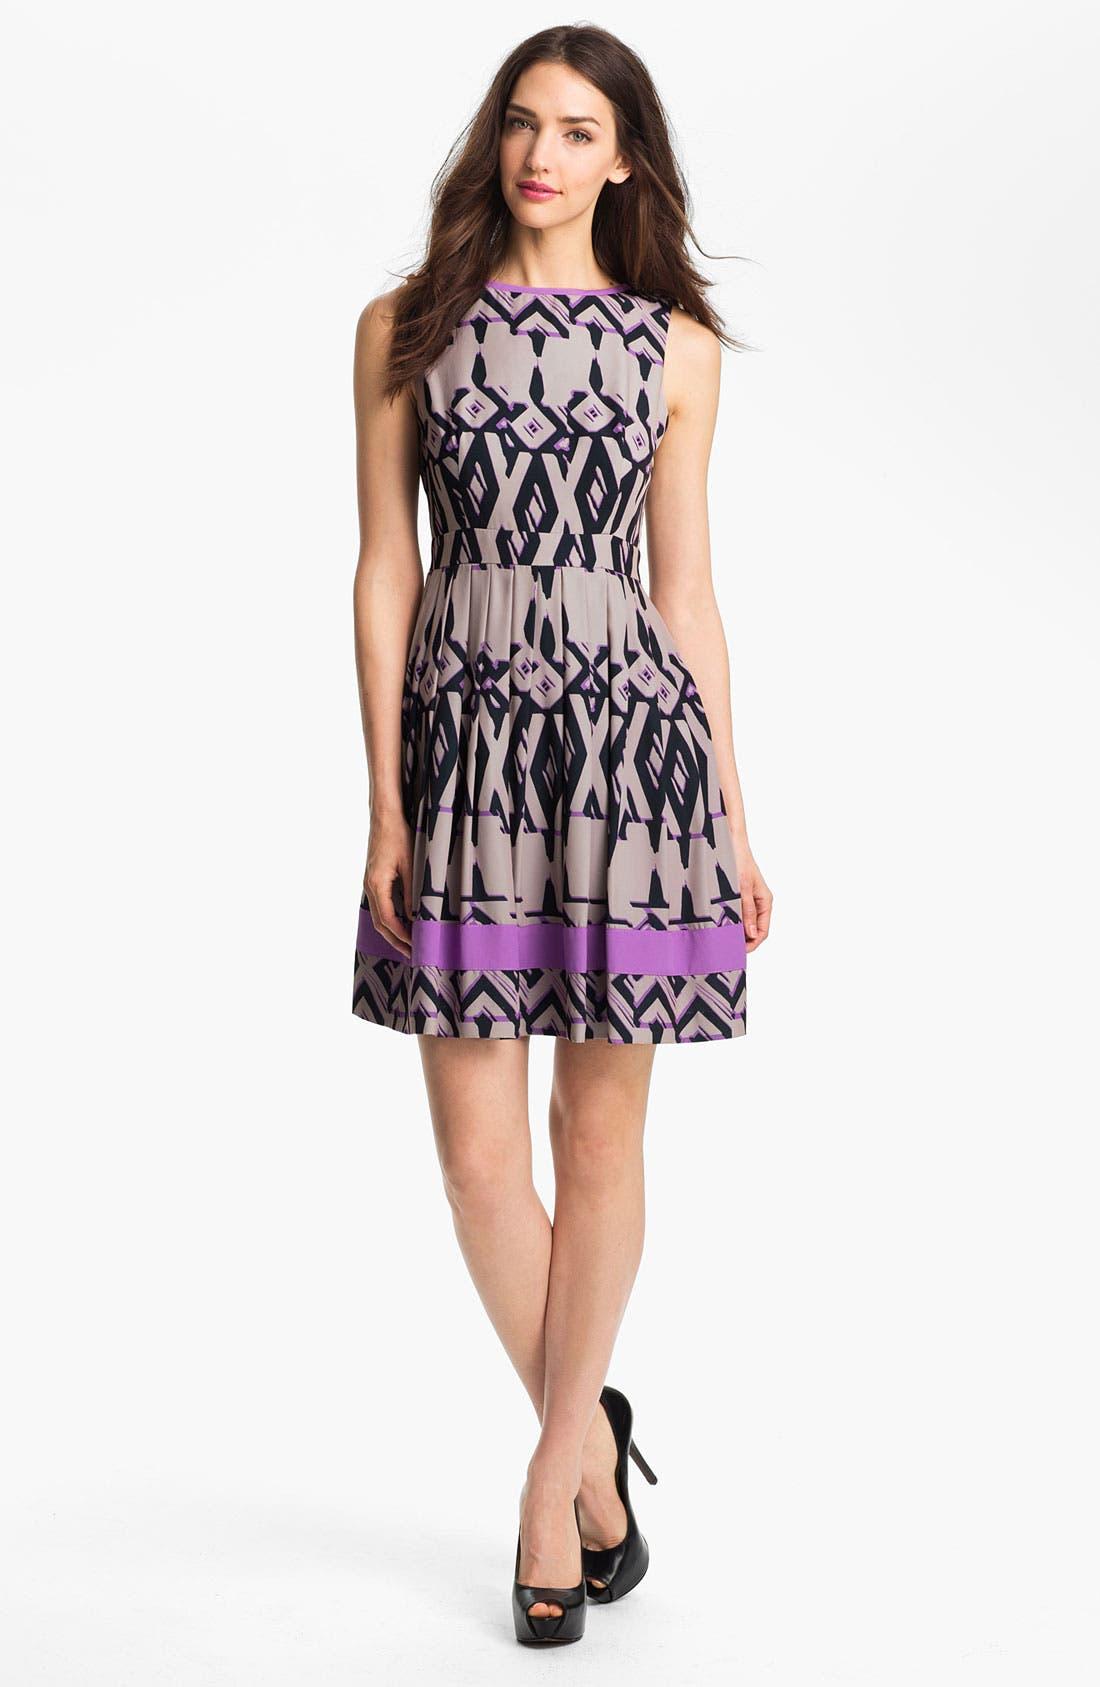 Main Image - Jessica Simpson Print Fit & Flare Dress